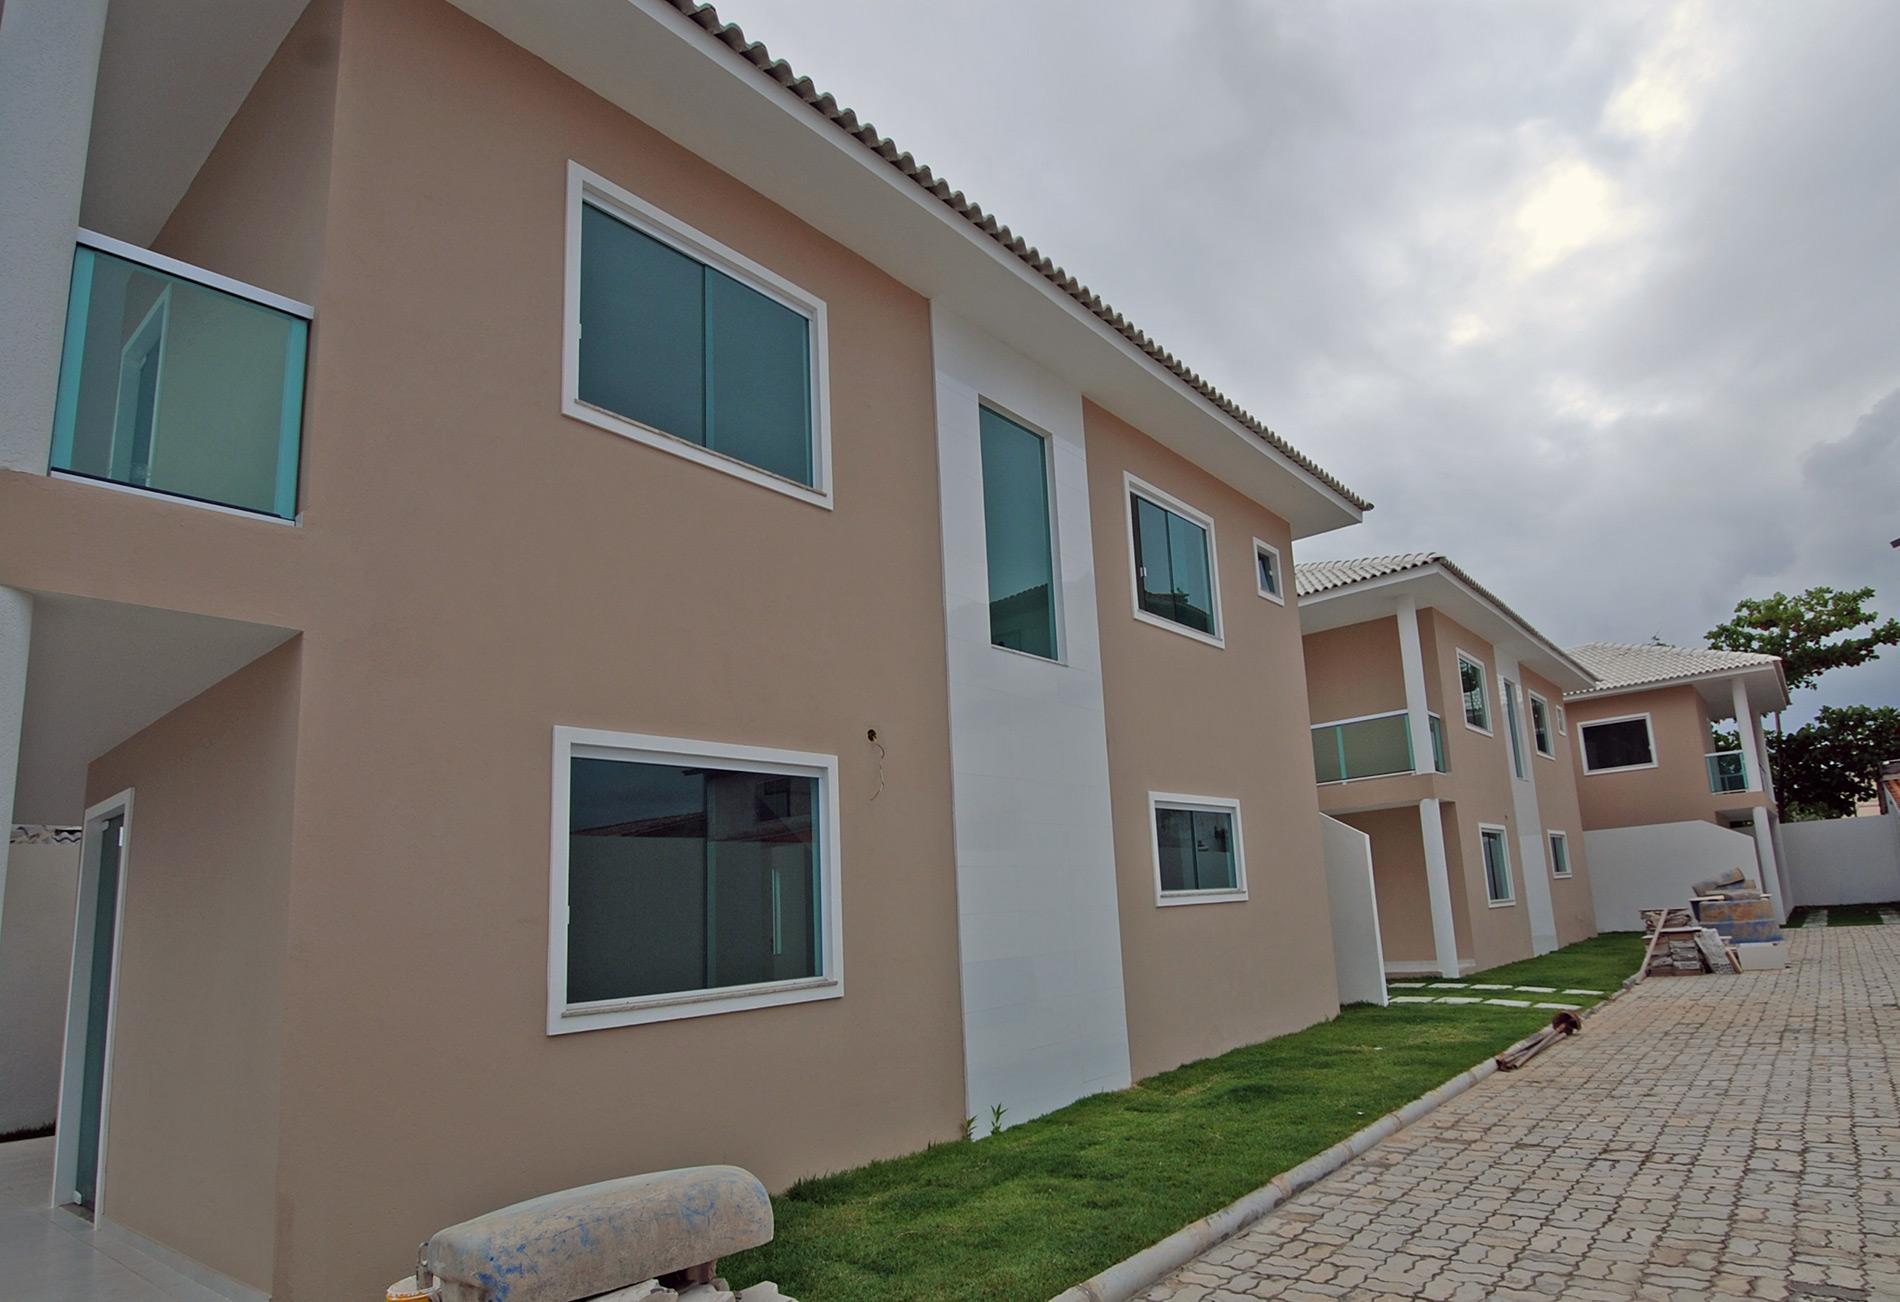 Casa moderna e nova venda no miragem hansen im veis for Casas modernas brasil